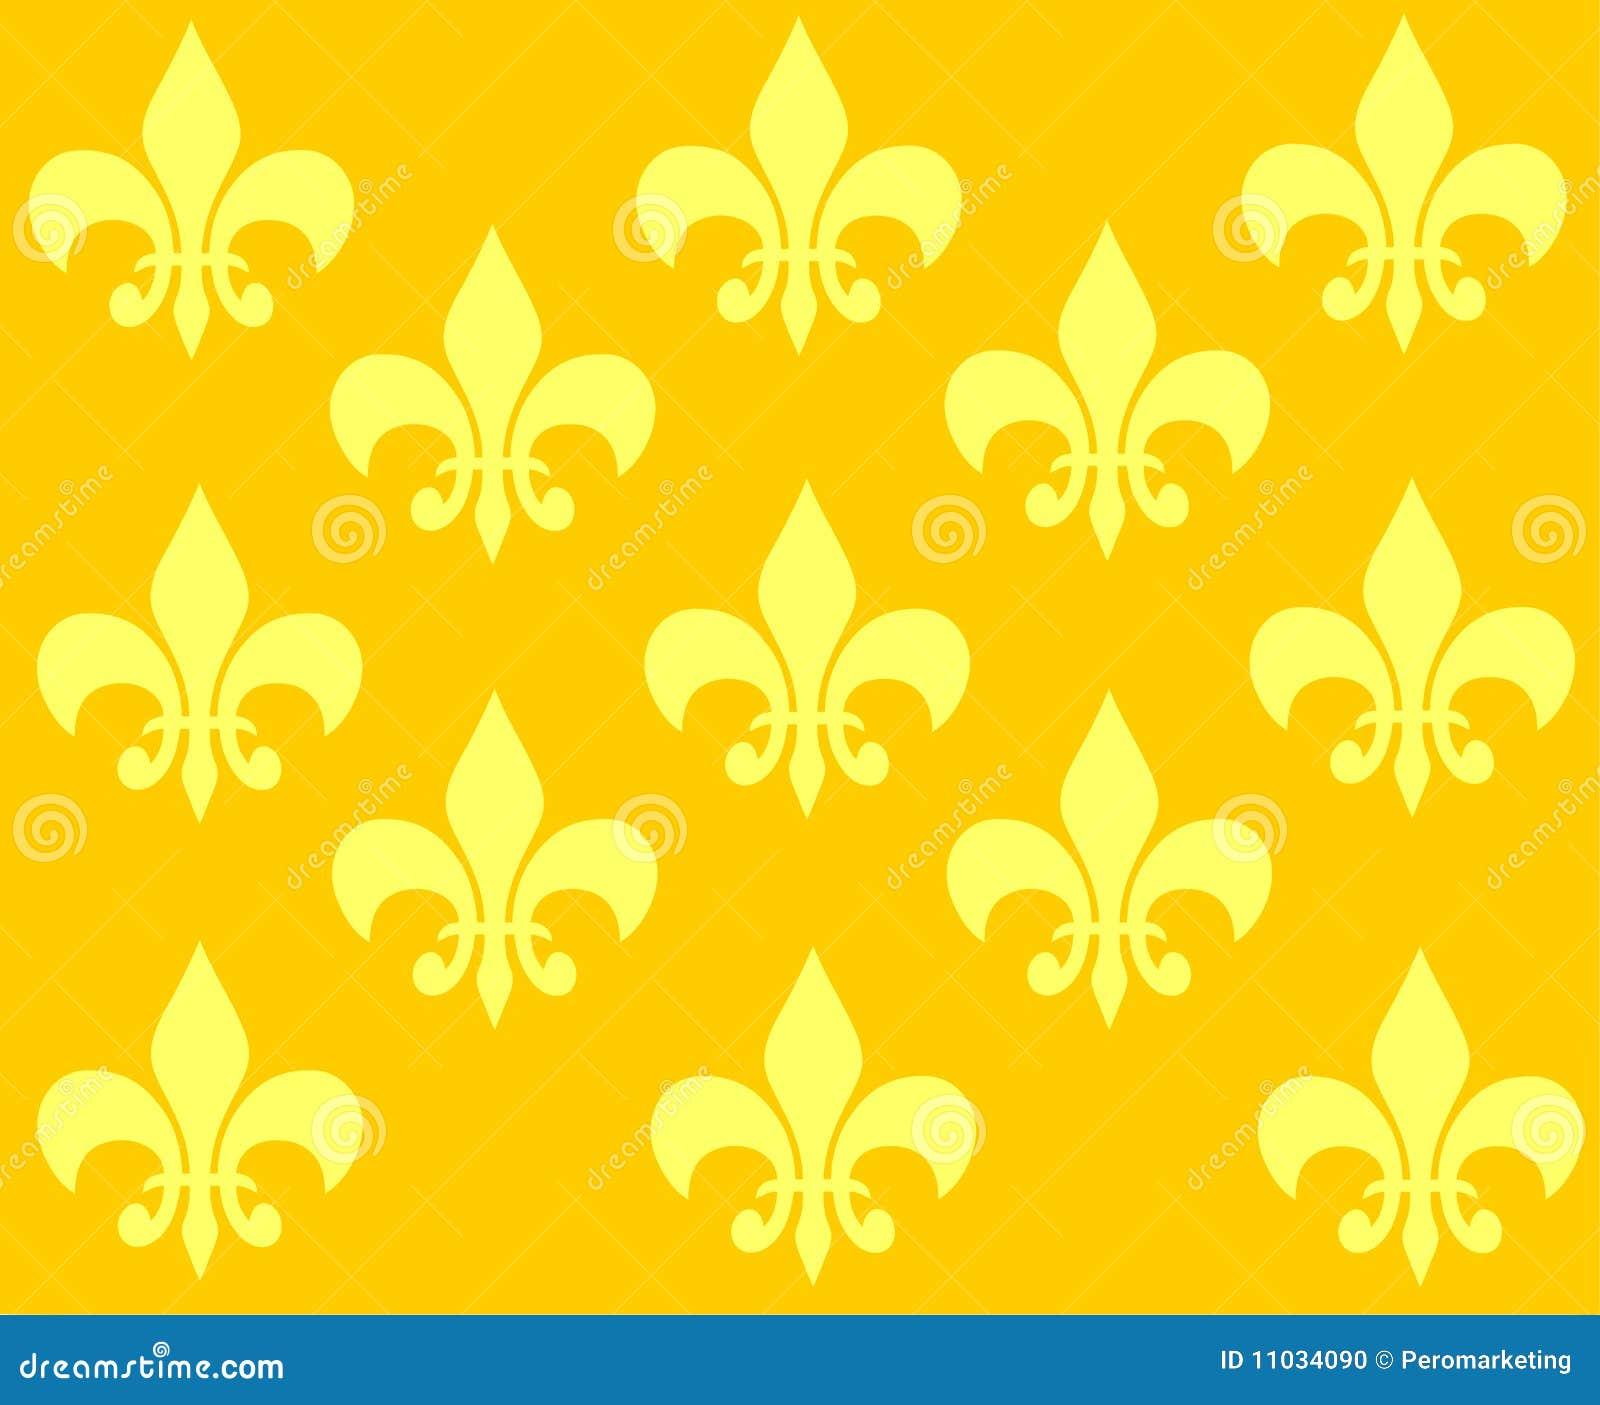 фото жёлтые обои